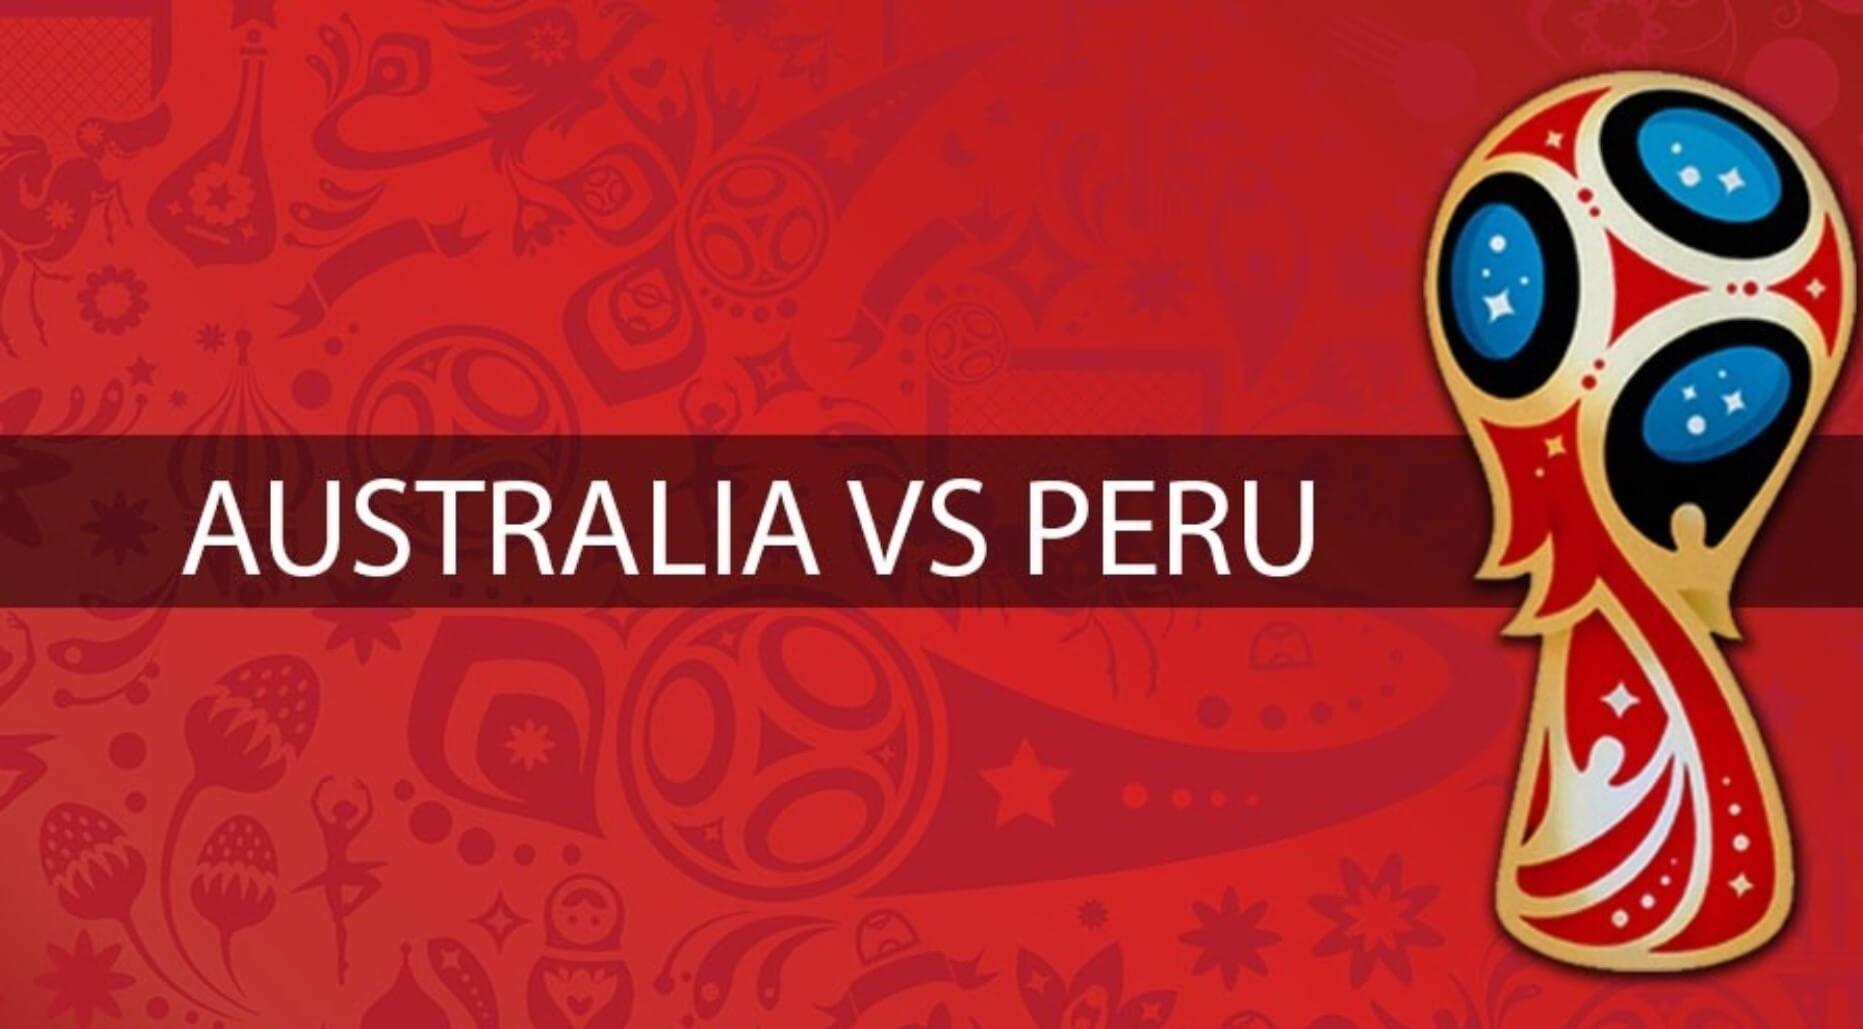 FIFA बुहुम काप 2018: पेरुआ ऑस्ट्रेलियाखौ 2-0 आव फेजेनो